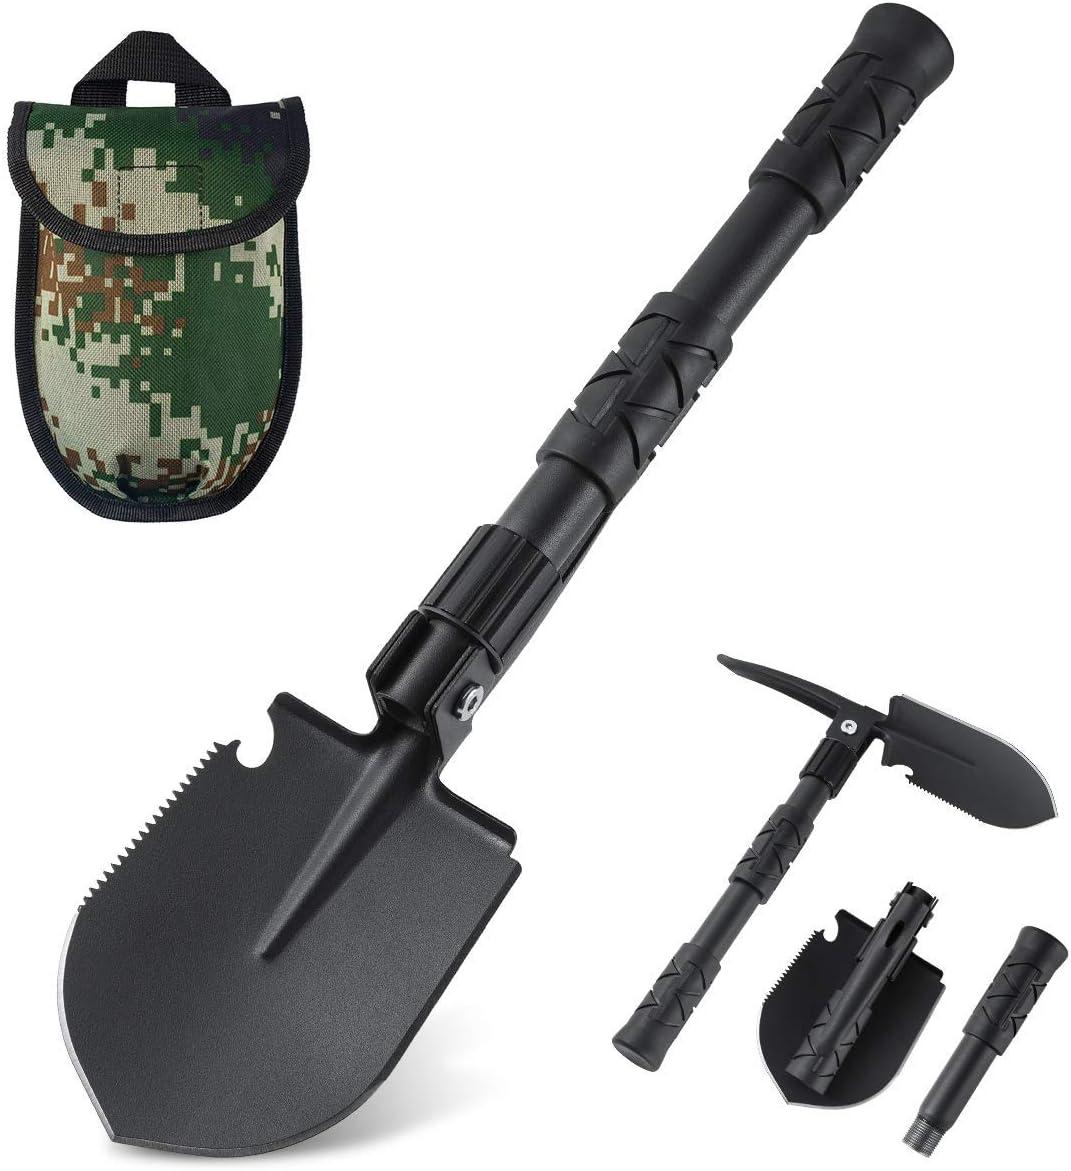 BOYISEN OKOOLCAMP Folding Shovel Tri-fold Camping Shovel Survival Snow Shovel Heavy Duty Alloy Steel 18.1 inch w/Saw Edge for Off Road, Camping, Gardening, Backpacking, Car Emergency